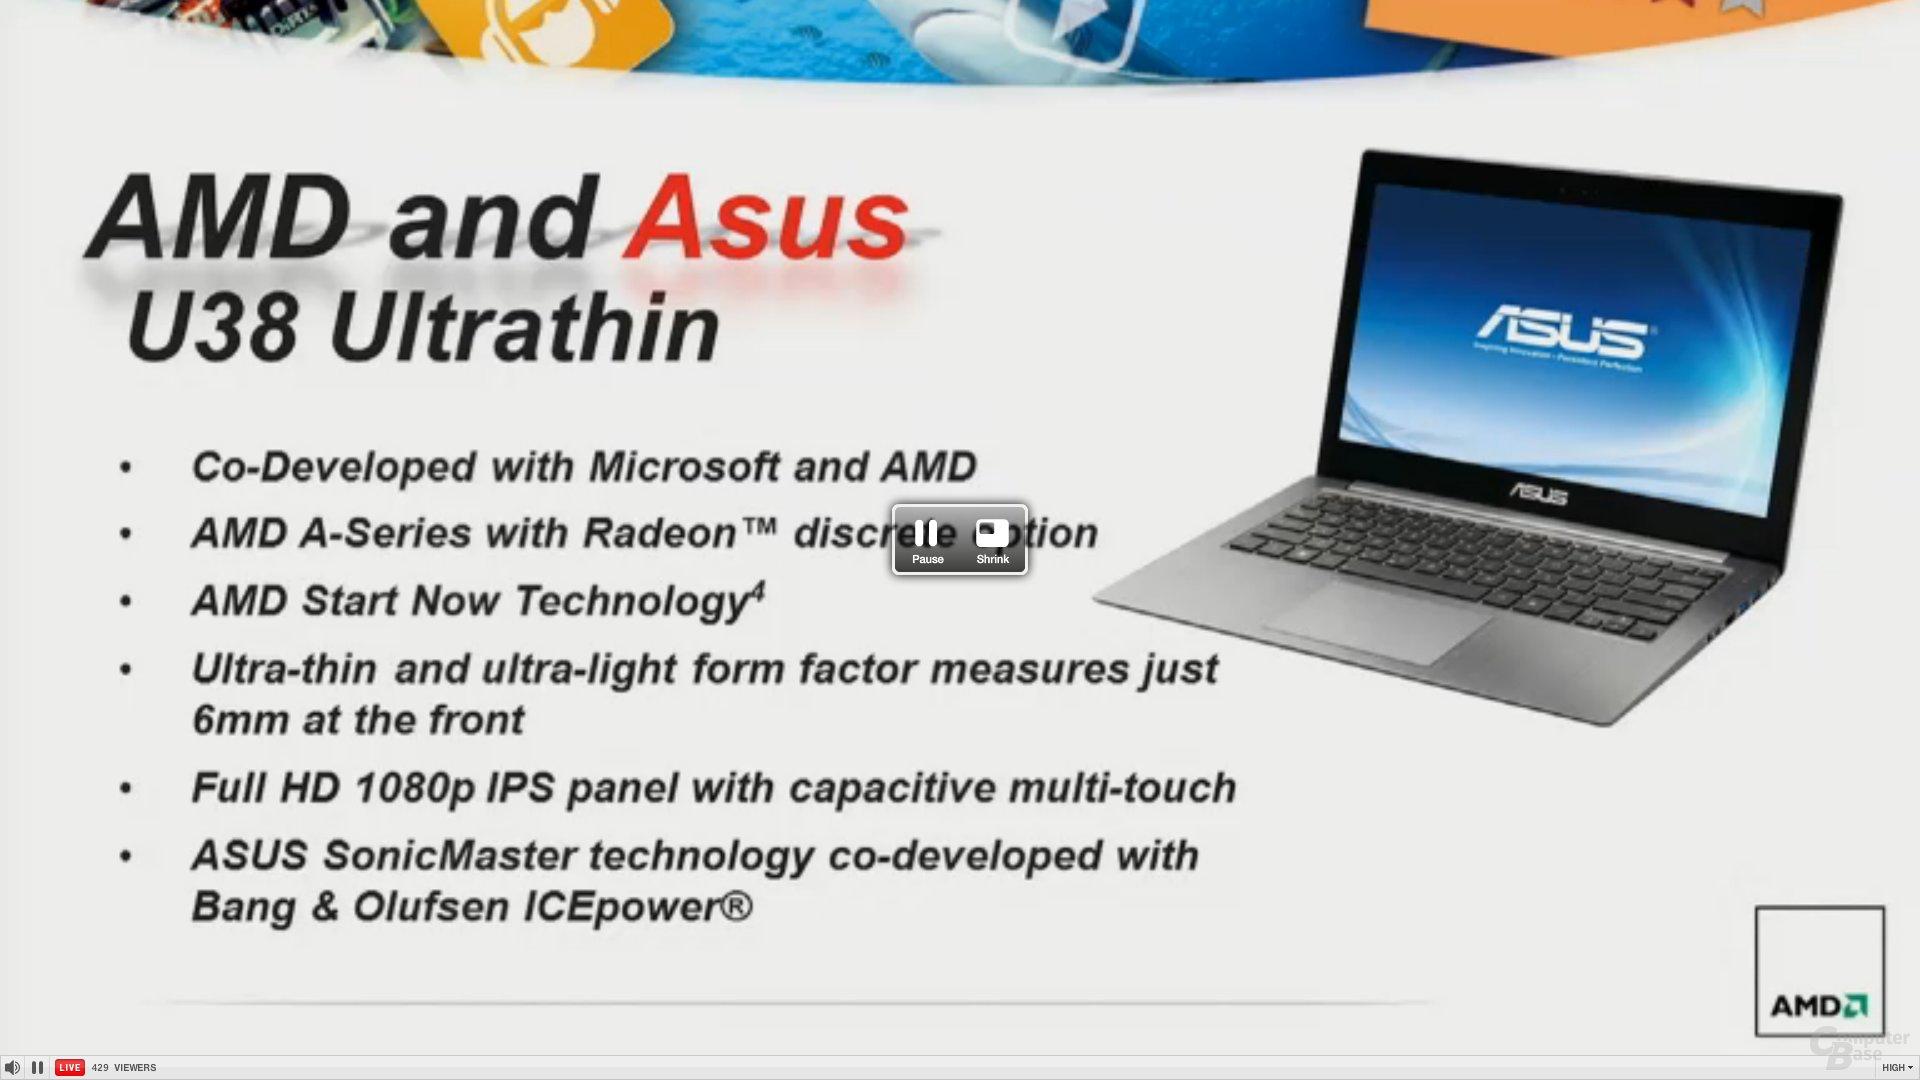 Asus U38 Ultrathin